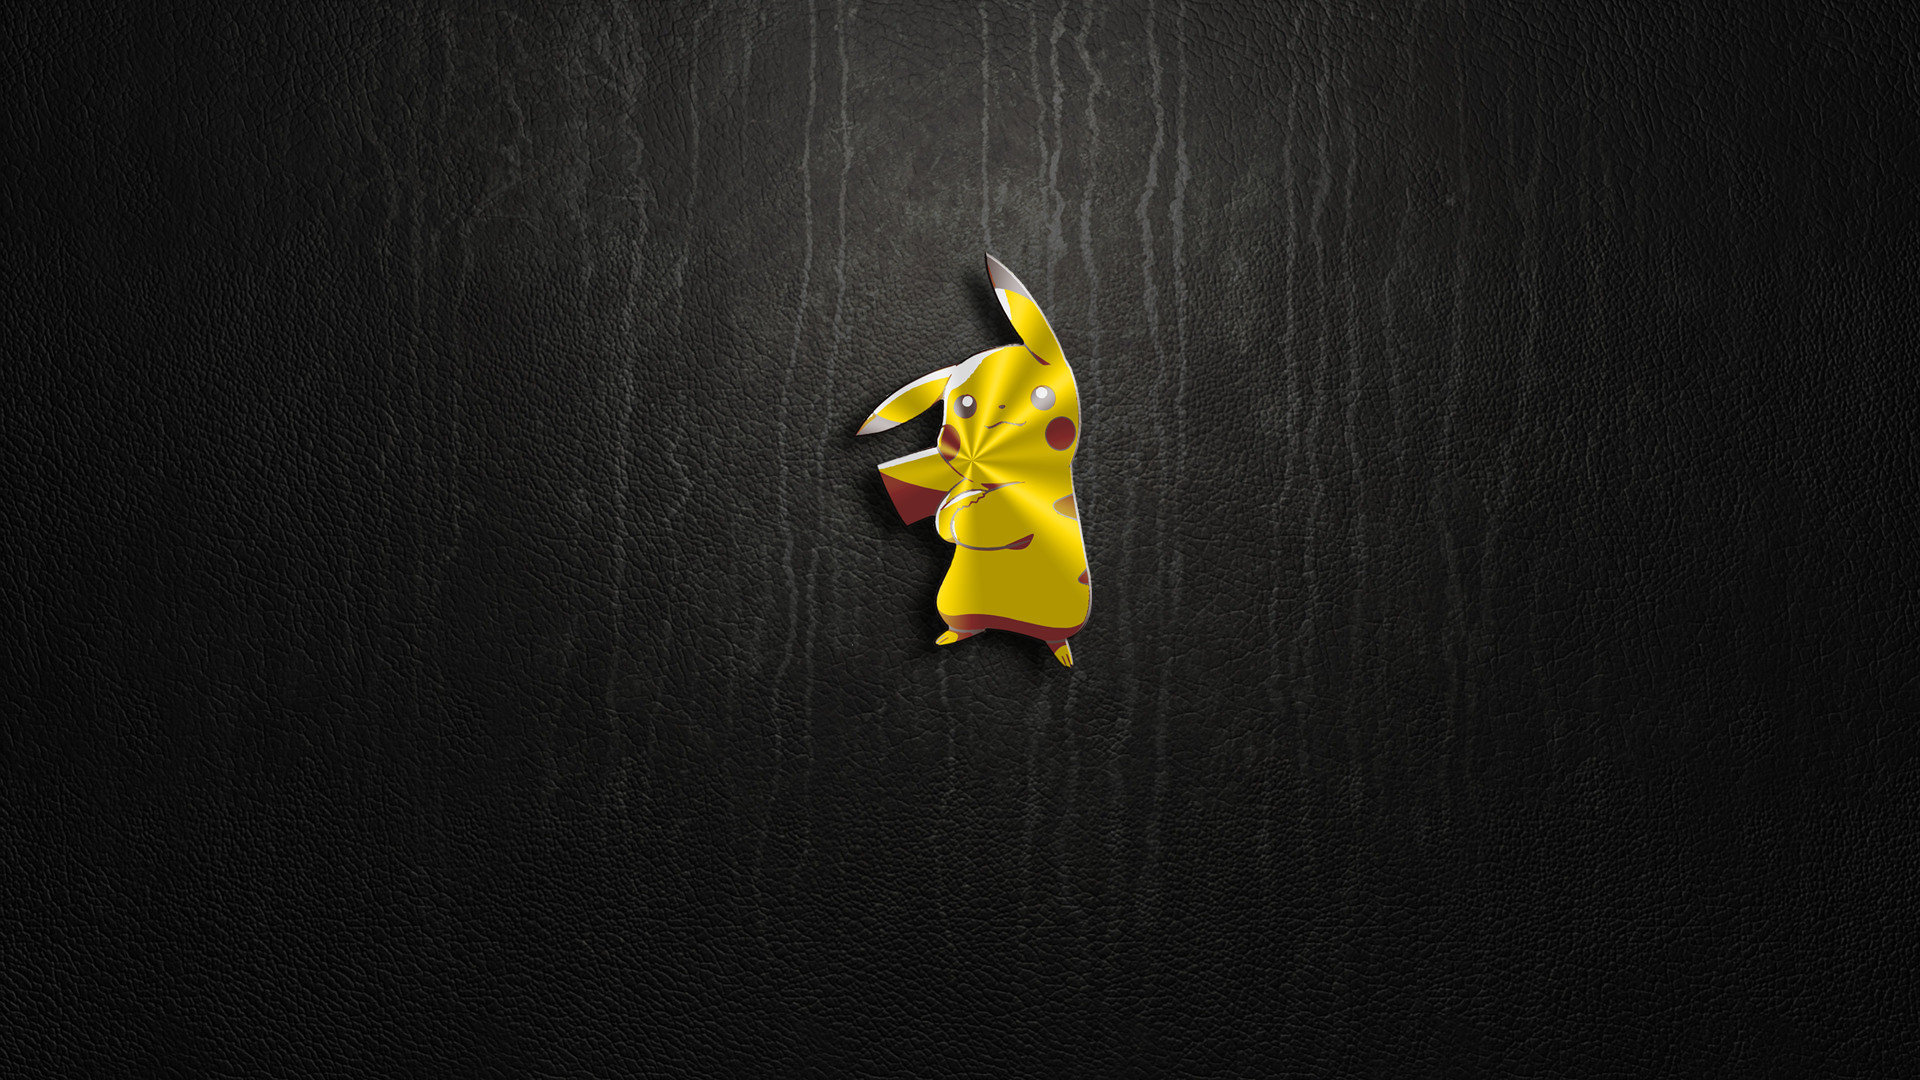 Free Pikachu high quality wallpaper ID:280365 for hd 1080p ...